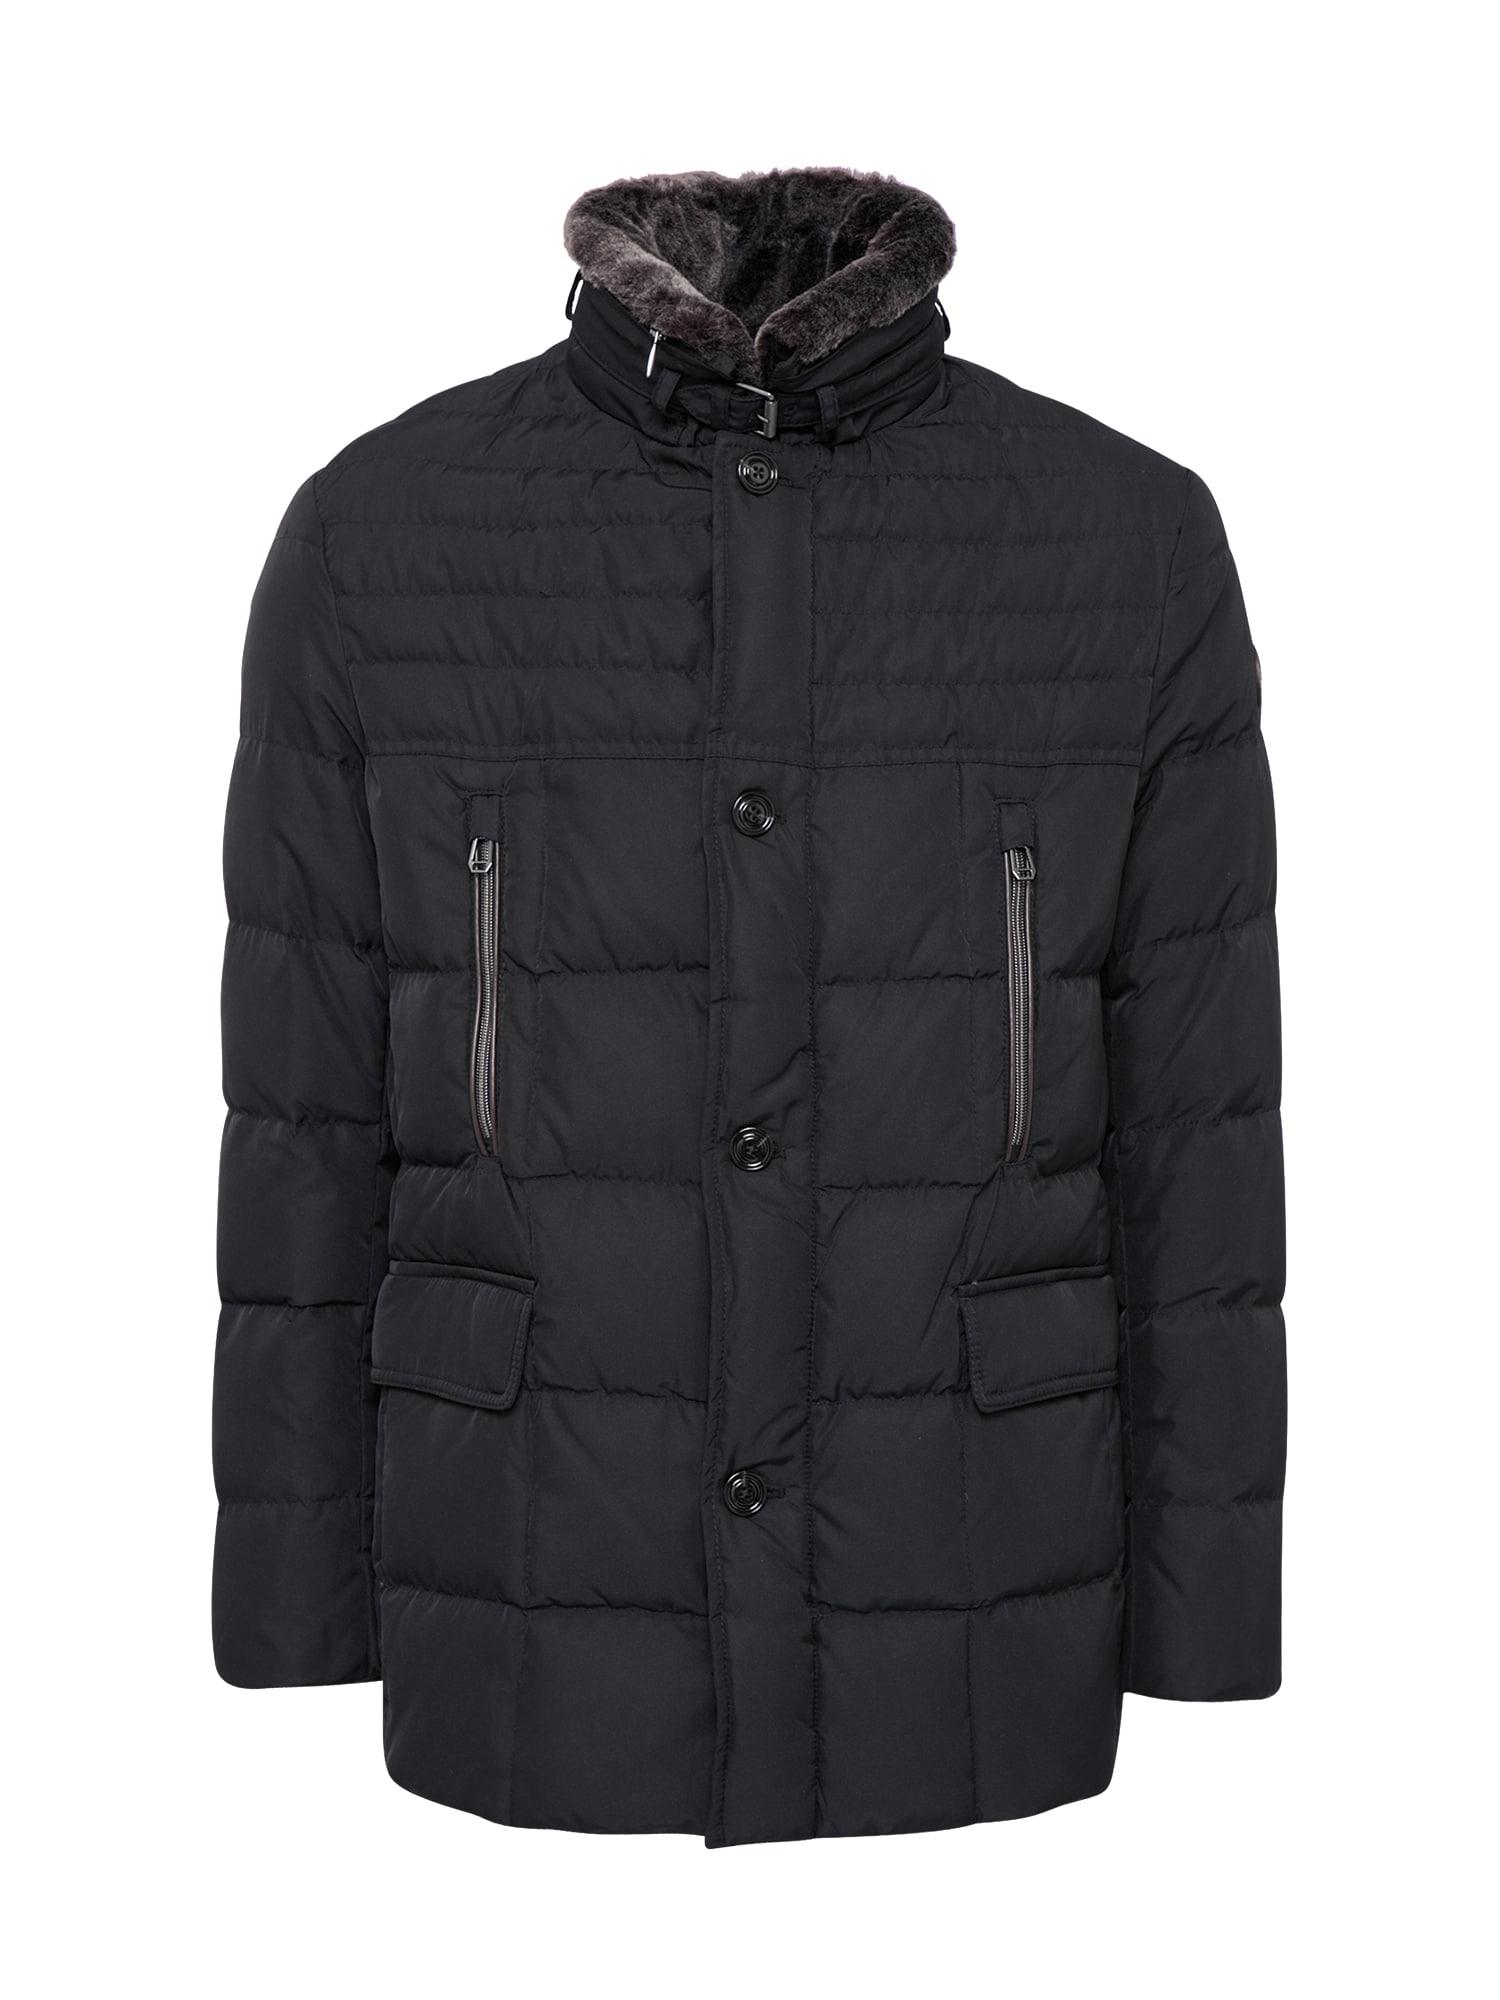 Zimní bunda DAROS černá JOOP!